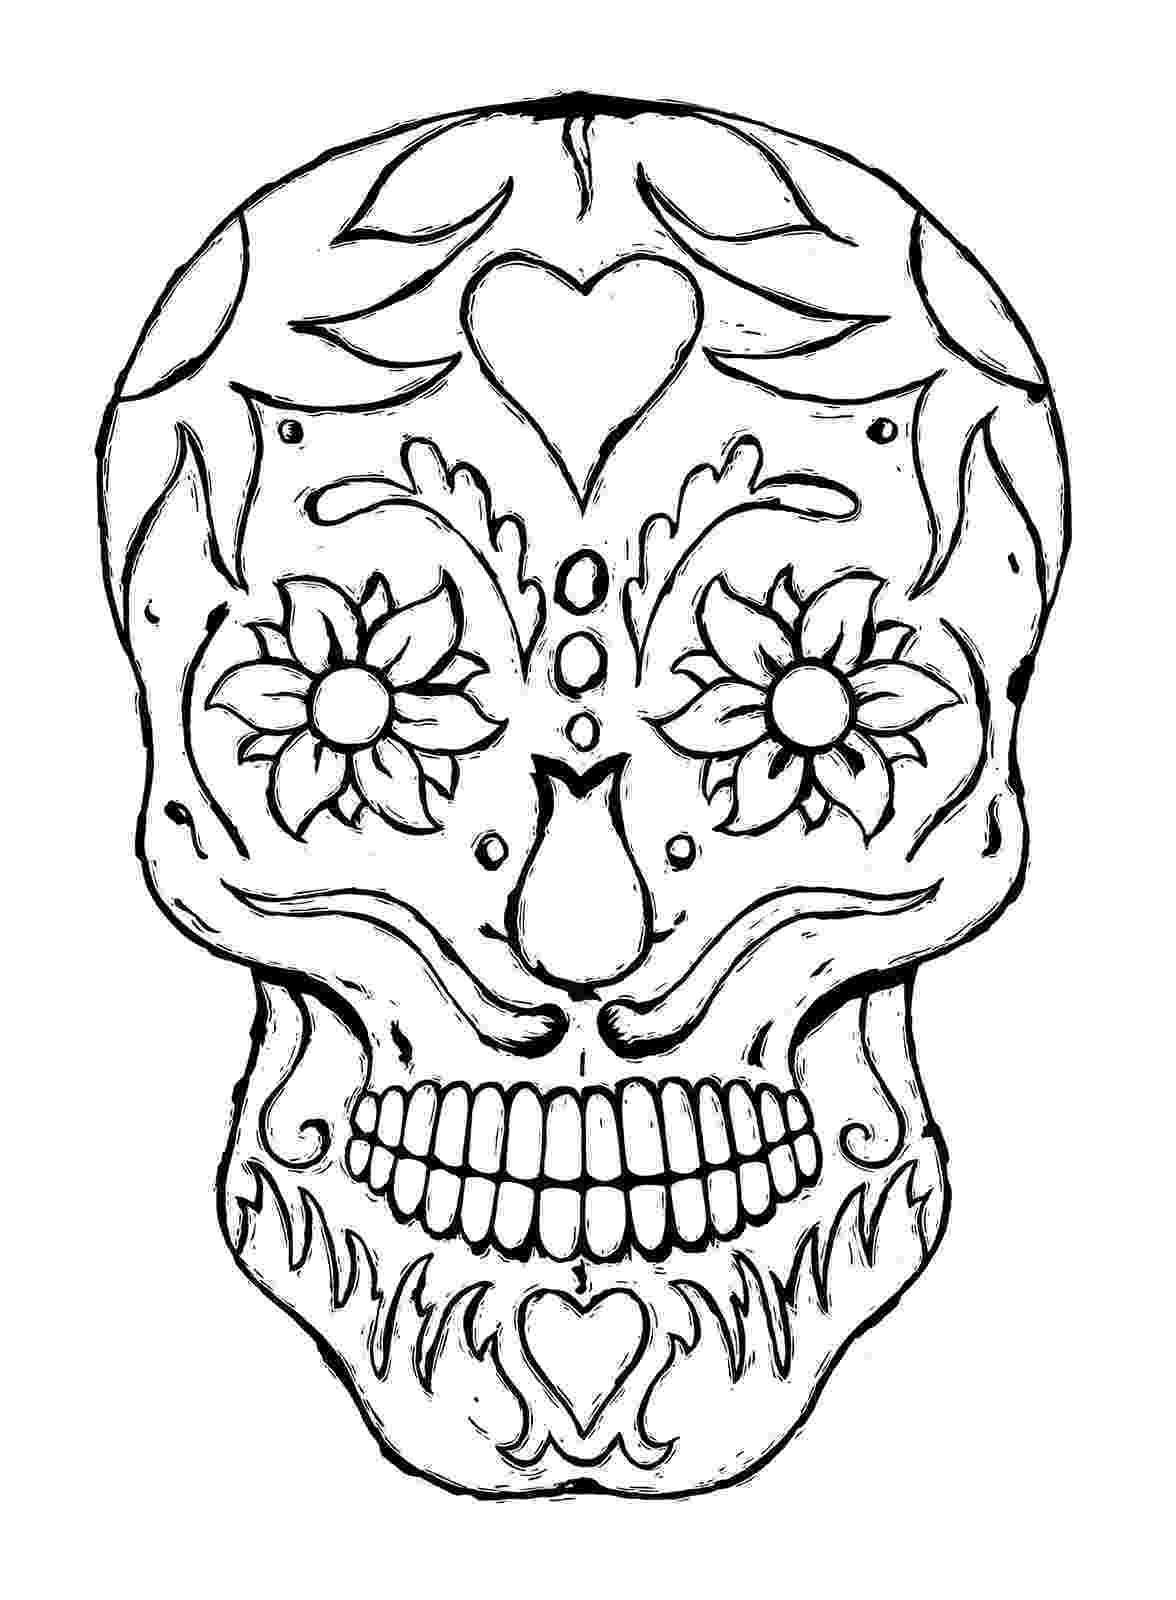 skull coloring sheet printable skulls coloring pages for kids cool2bkids skull coloring sheet